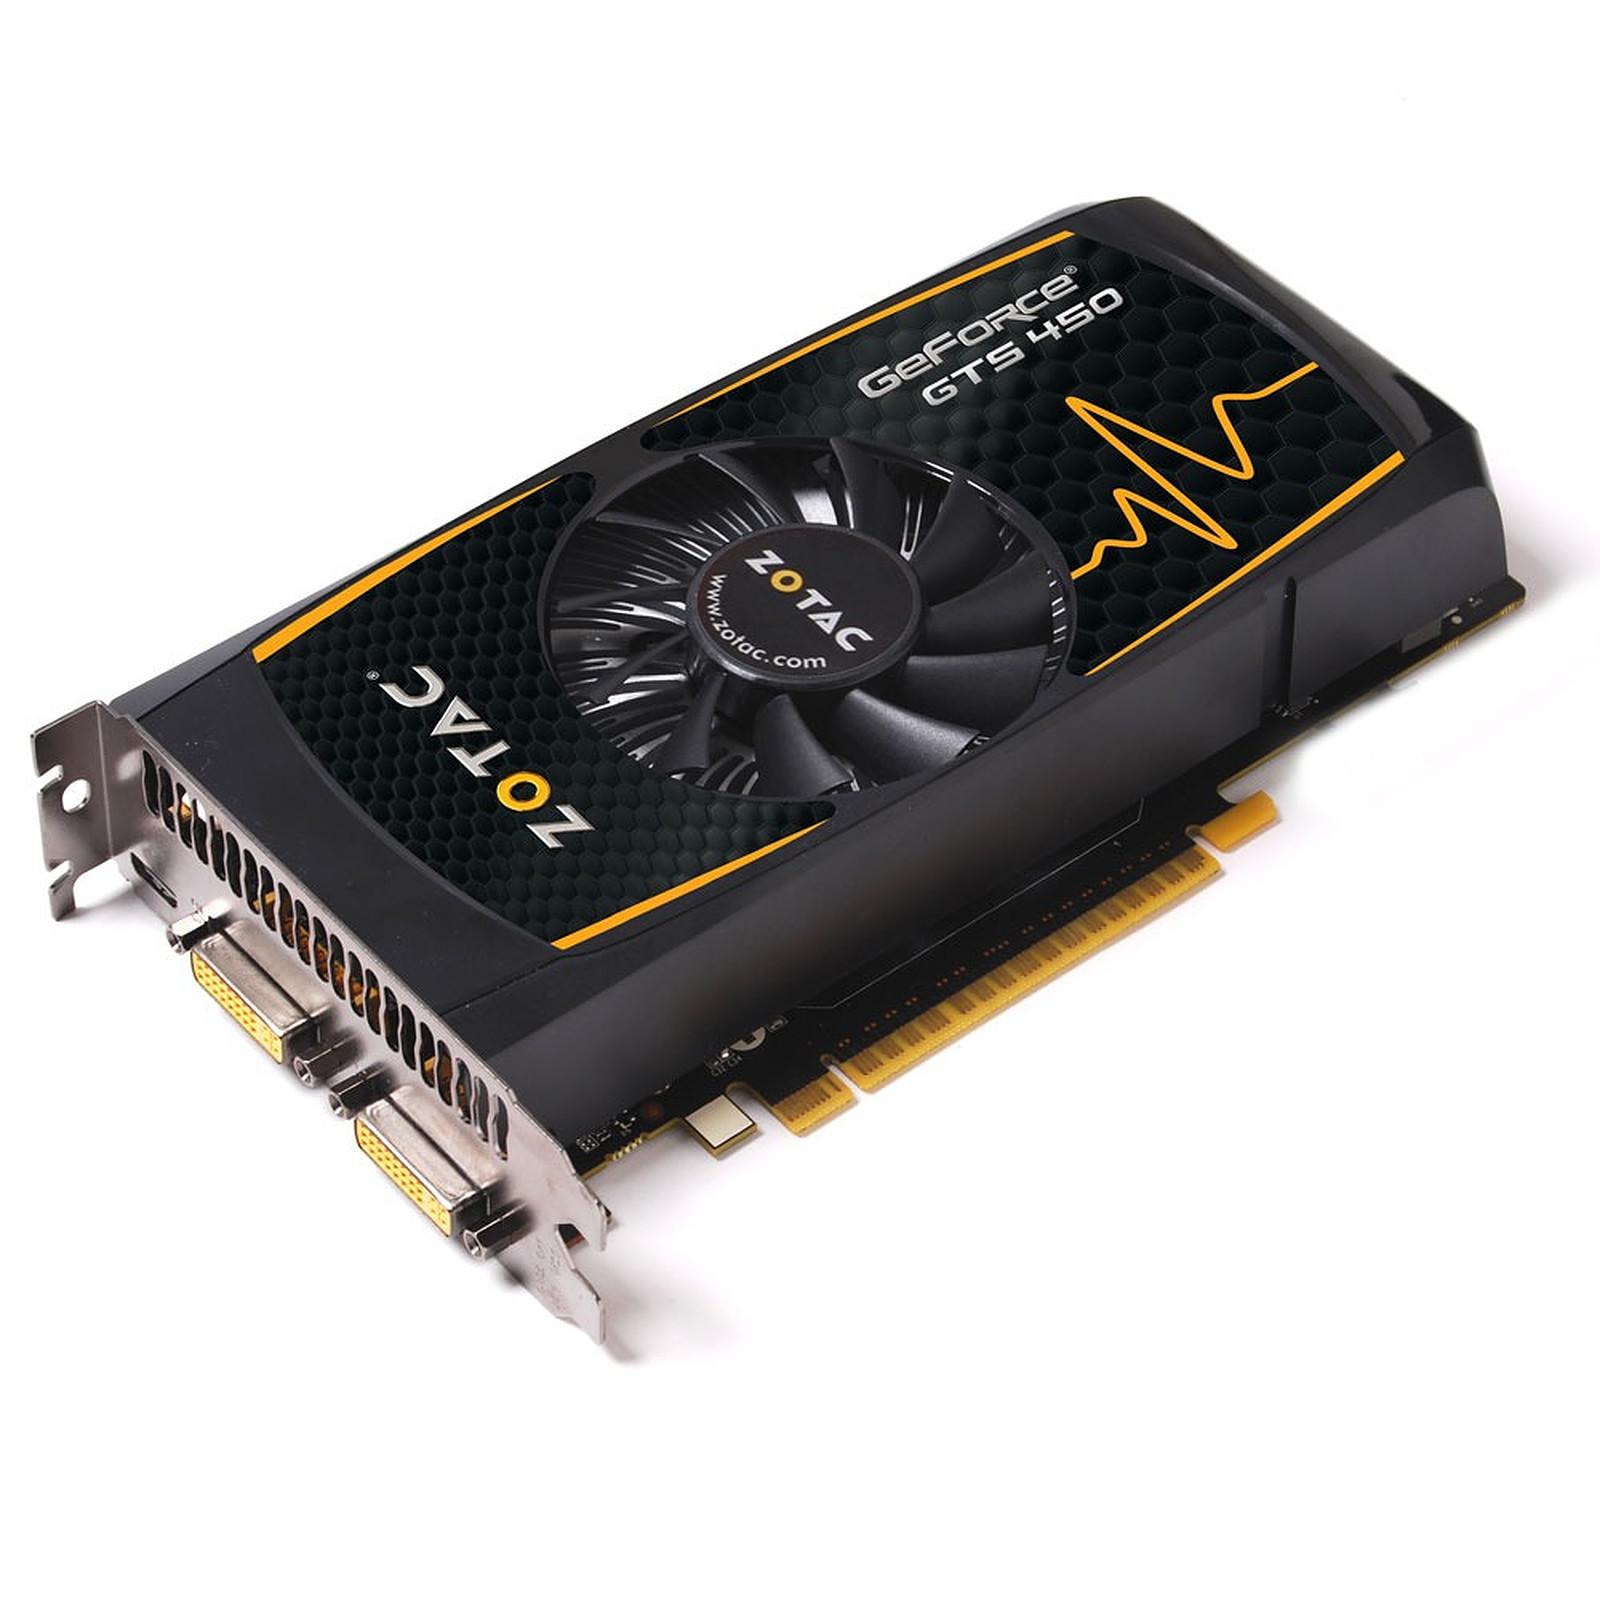 ZOTAC GeForce GTS 450 1 GB